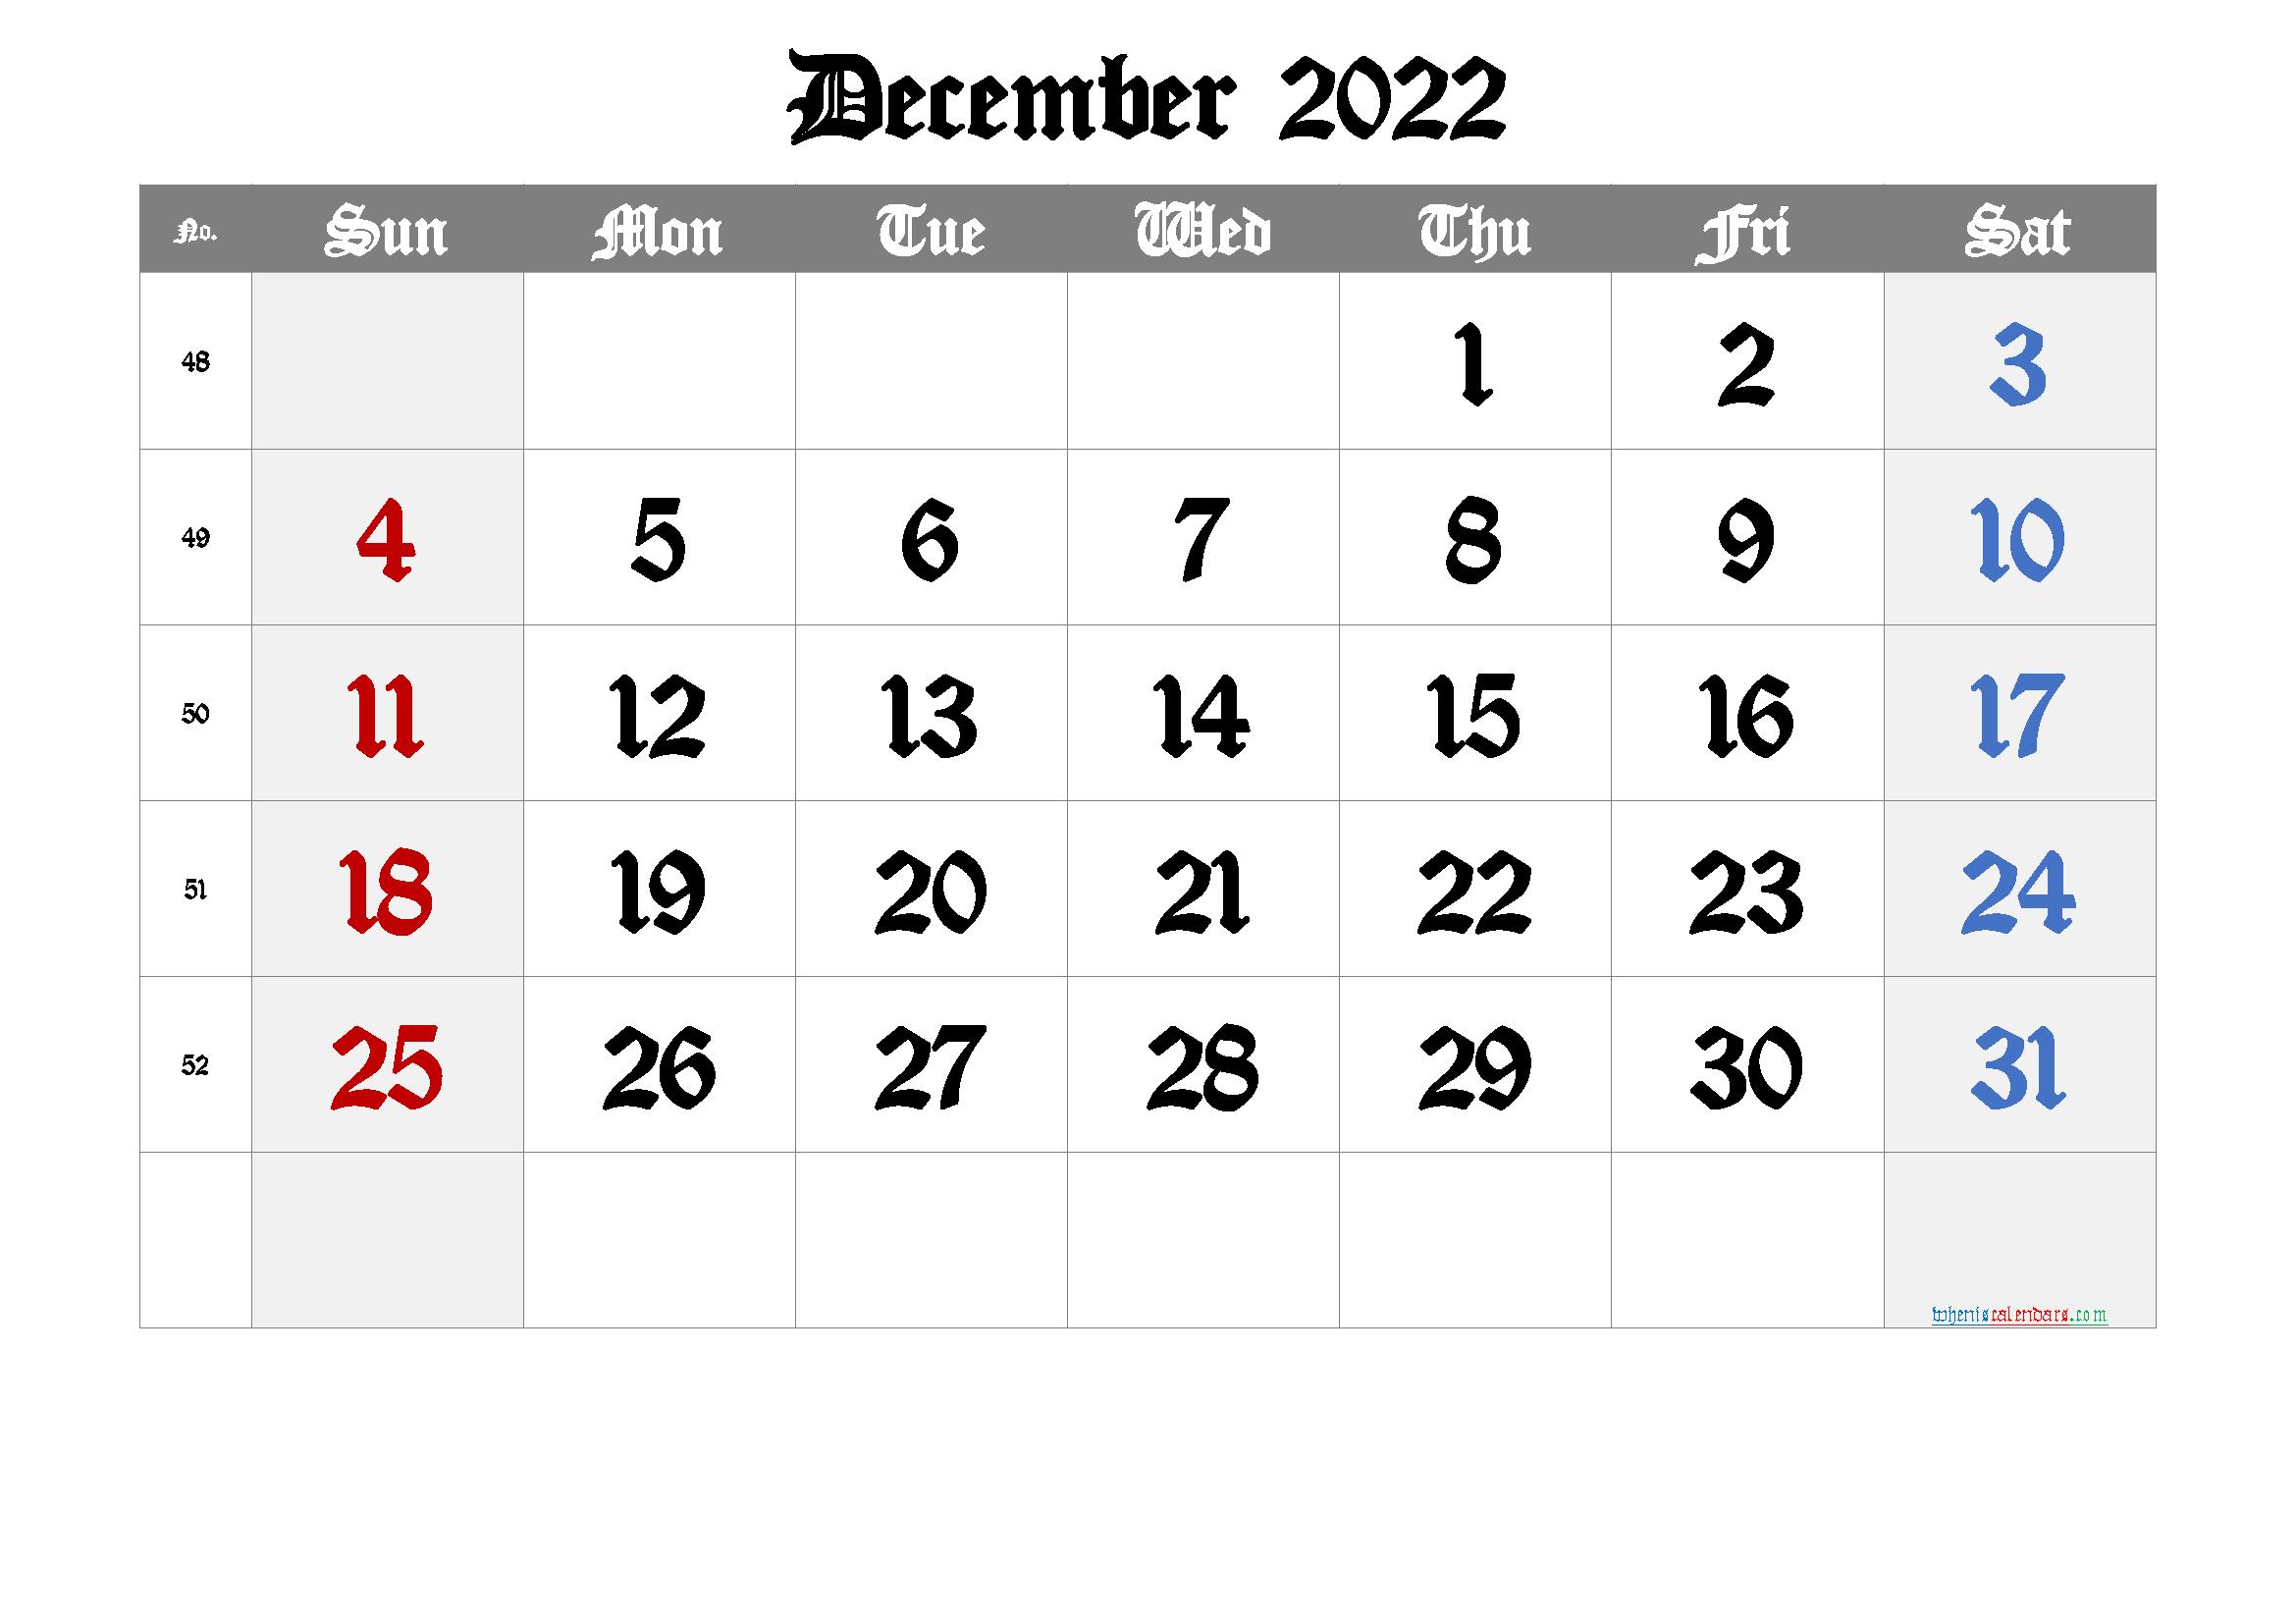 Printable Monthly Calendar December 2022.Free Printable Calendar 2022 December 6 Templates Monthly Calendar Printable Calendar Printables Calendar Template